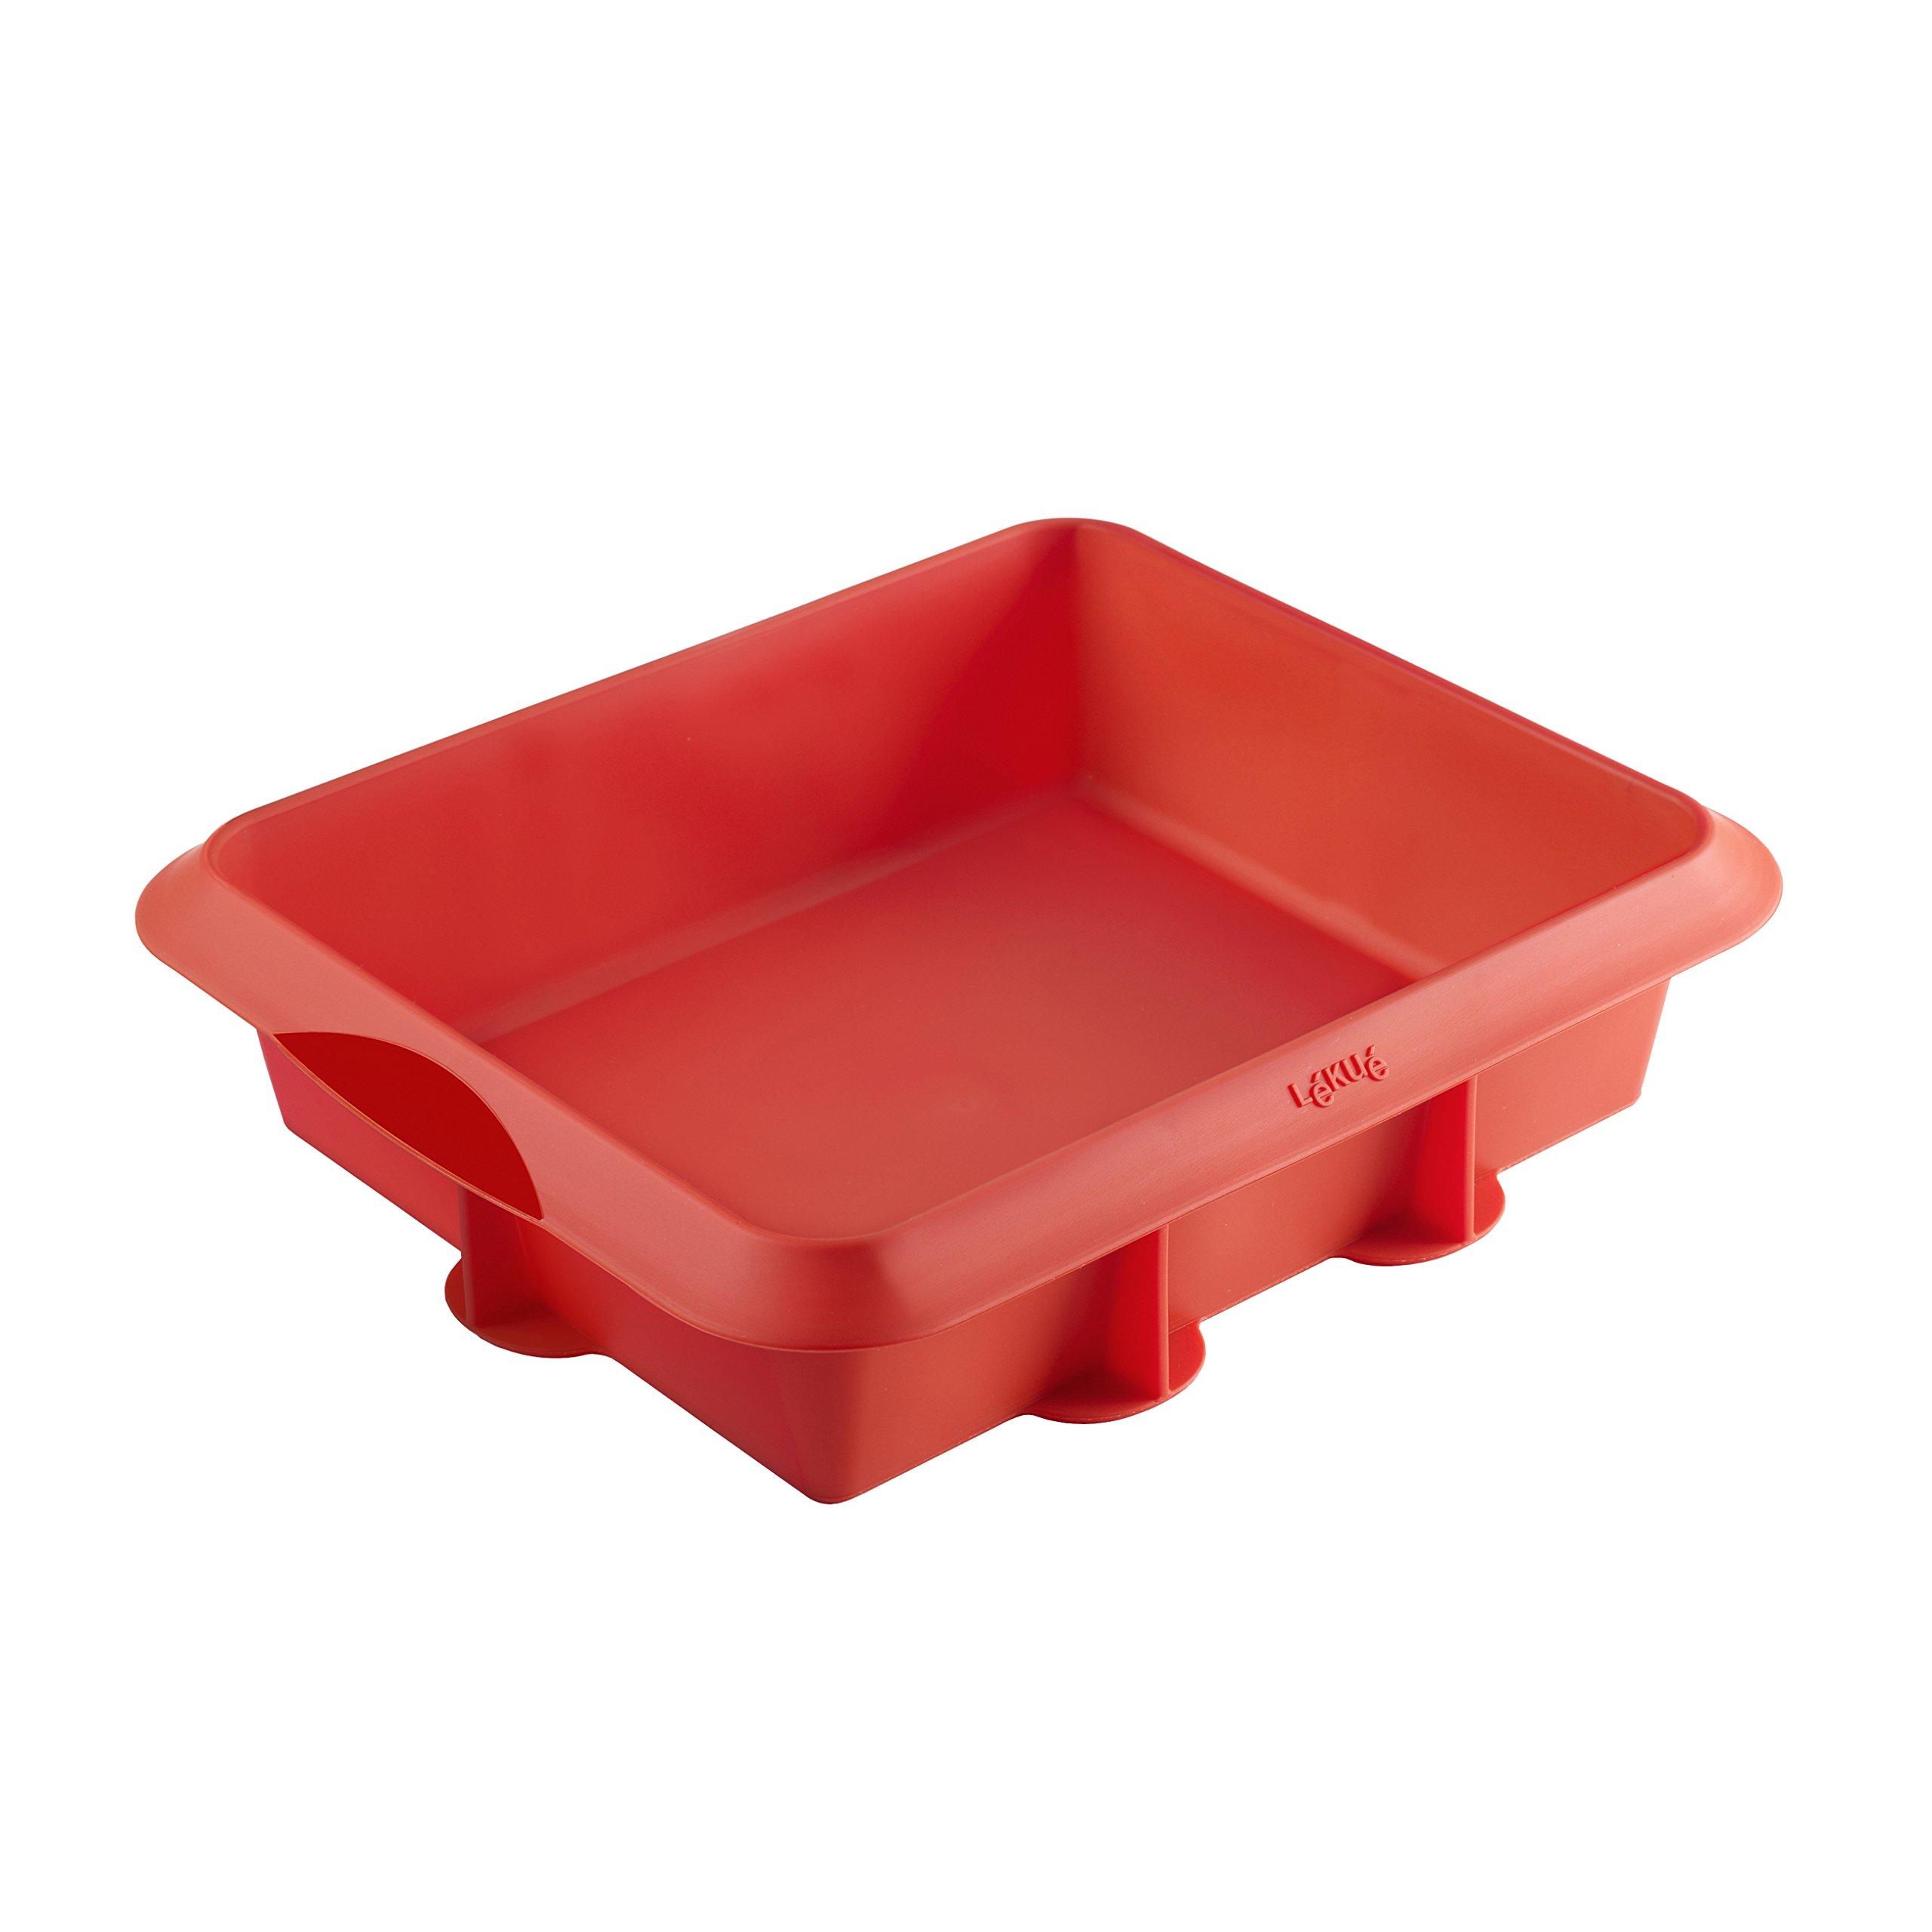 Lékué Classic - Molde para lasaña, color rojo product image